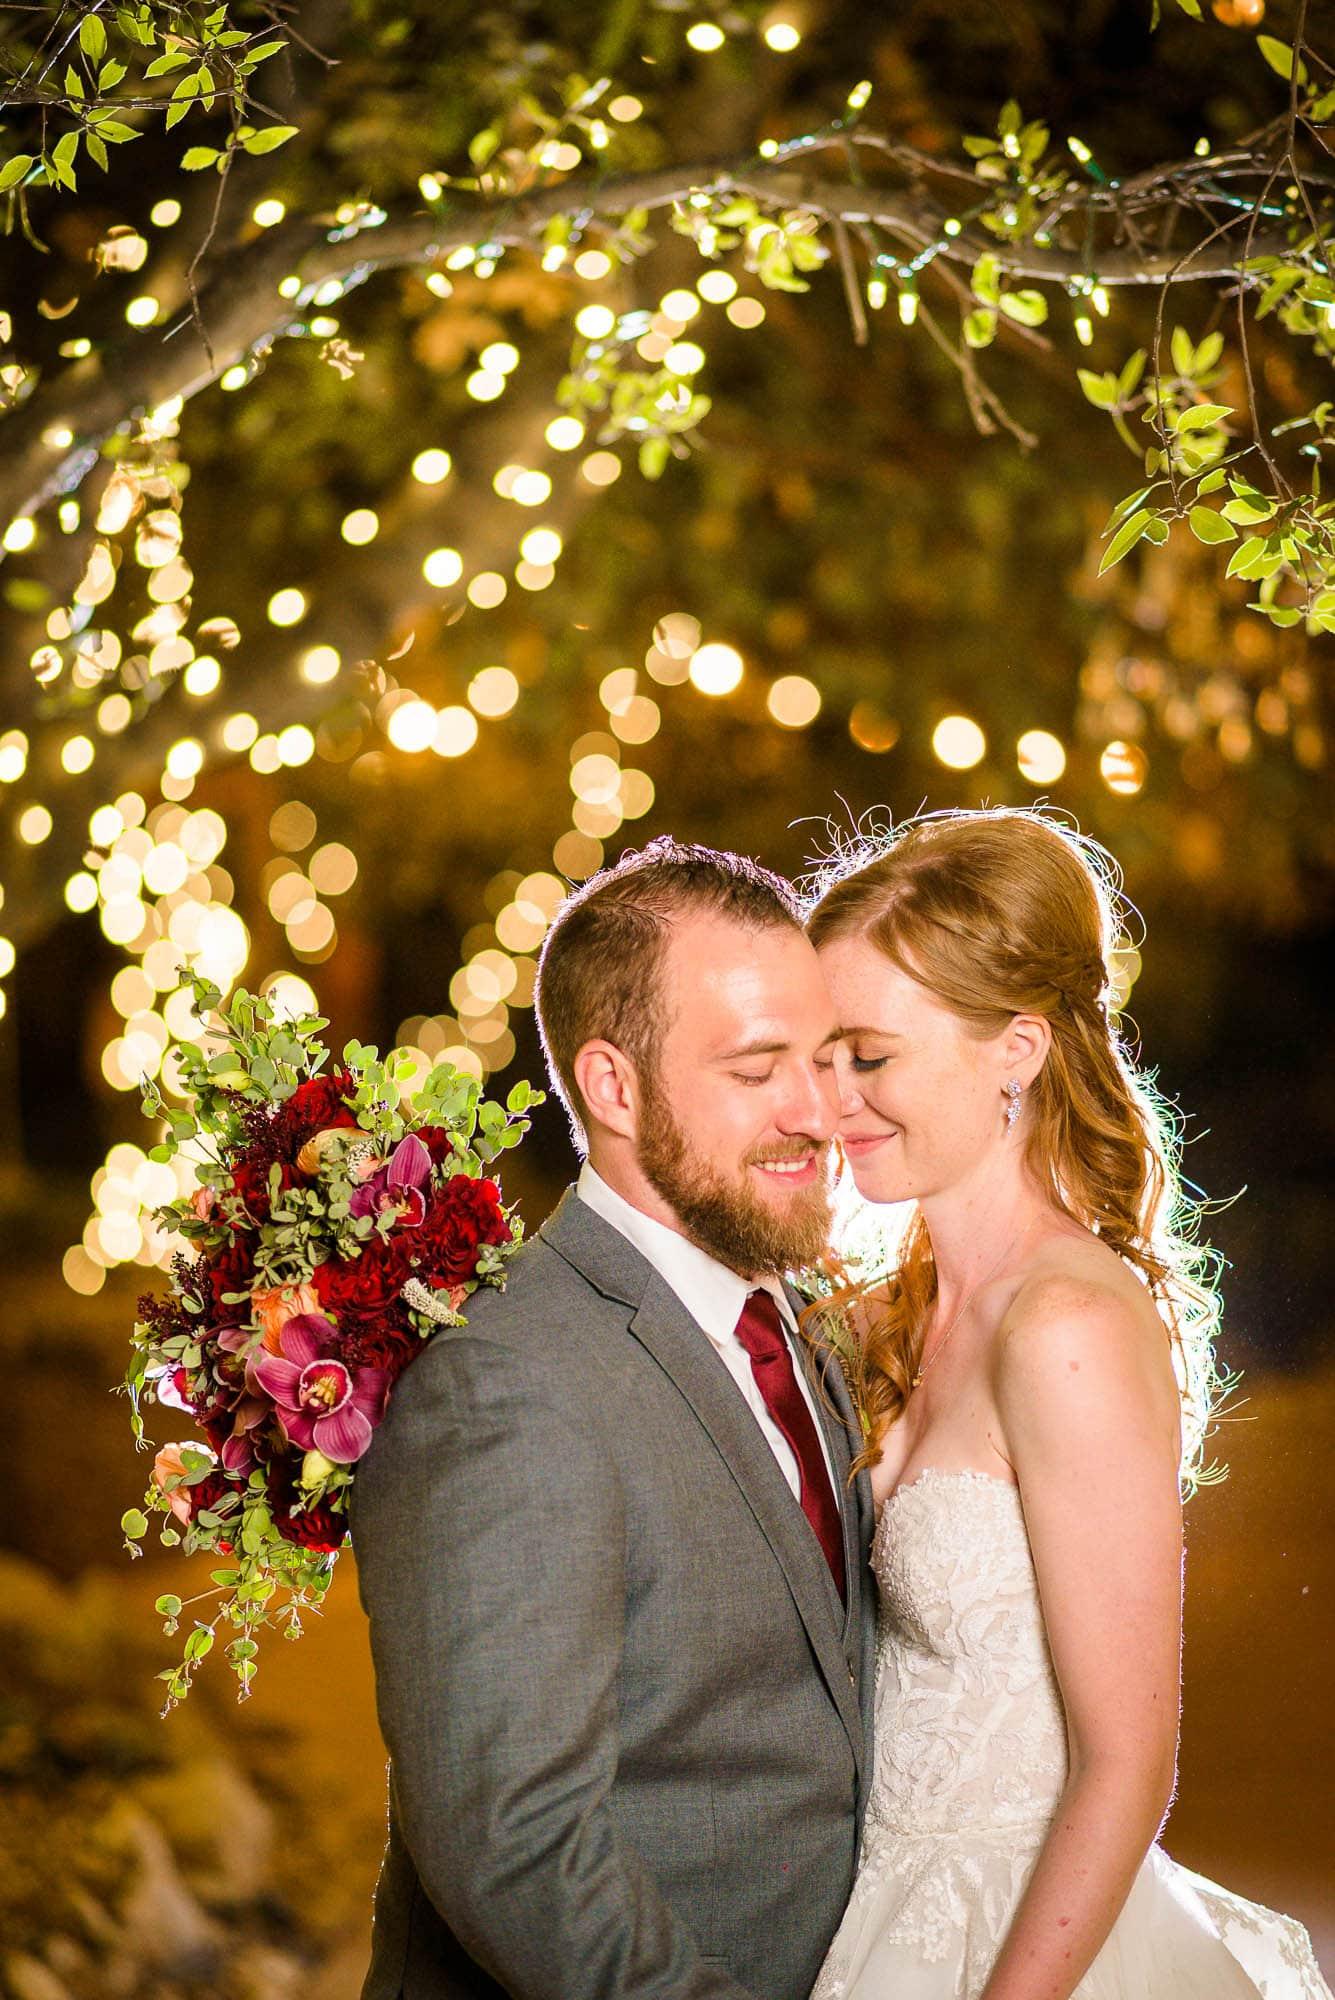 732_Alan_and_Heidi_Serendipity_Garden_Wedding_10-27-2018